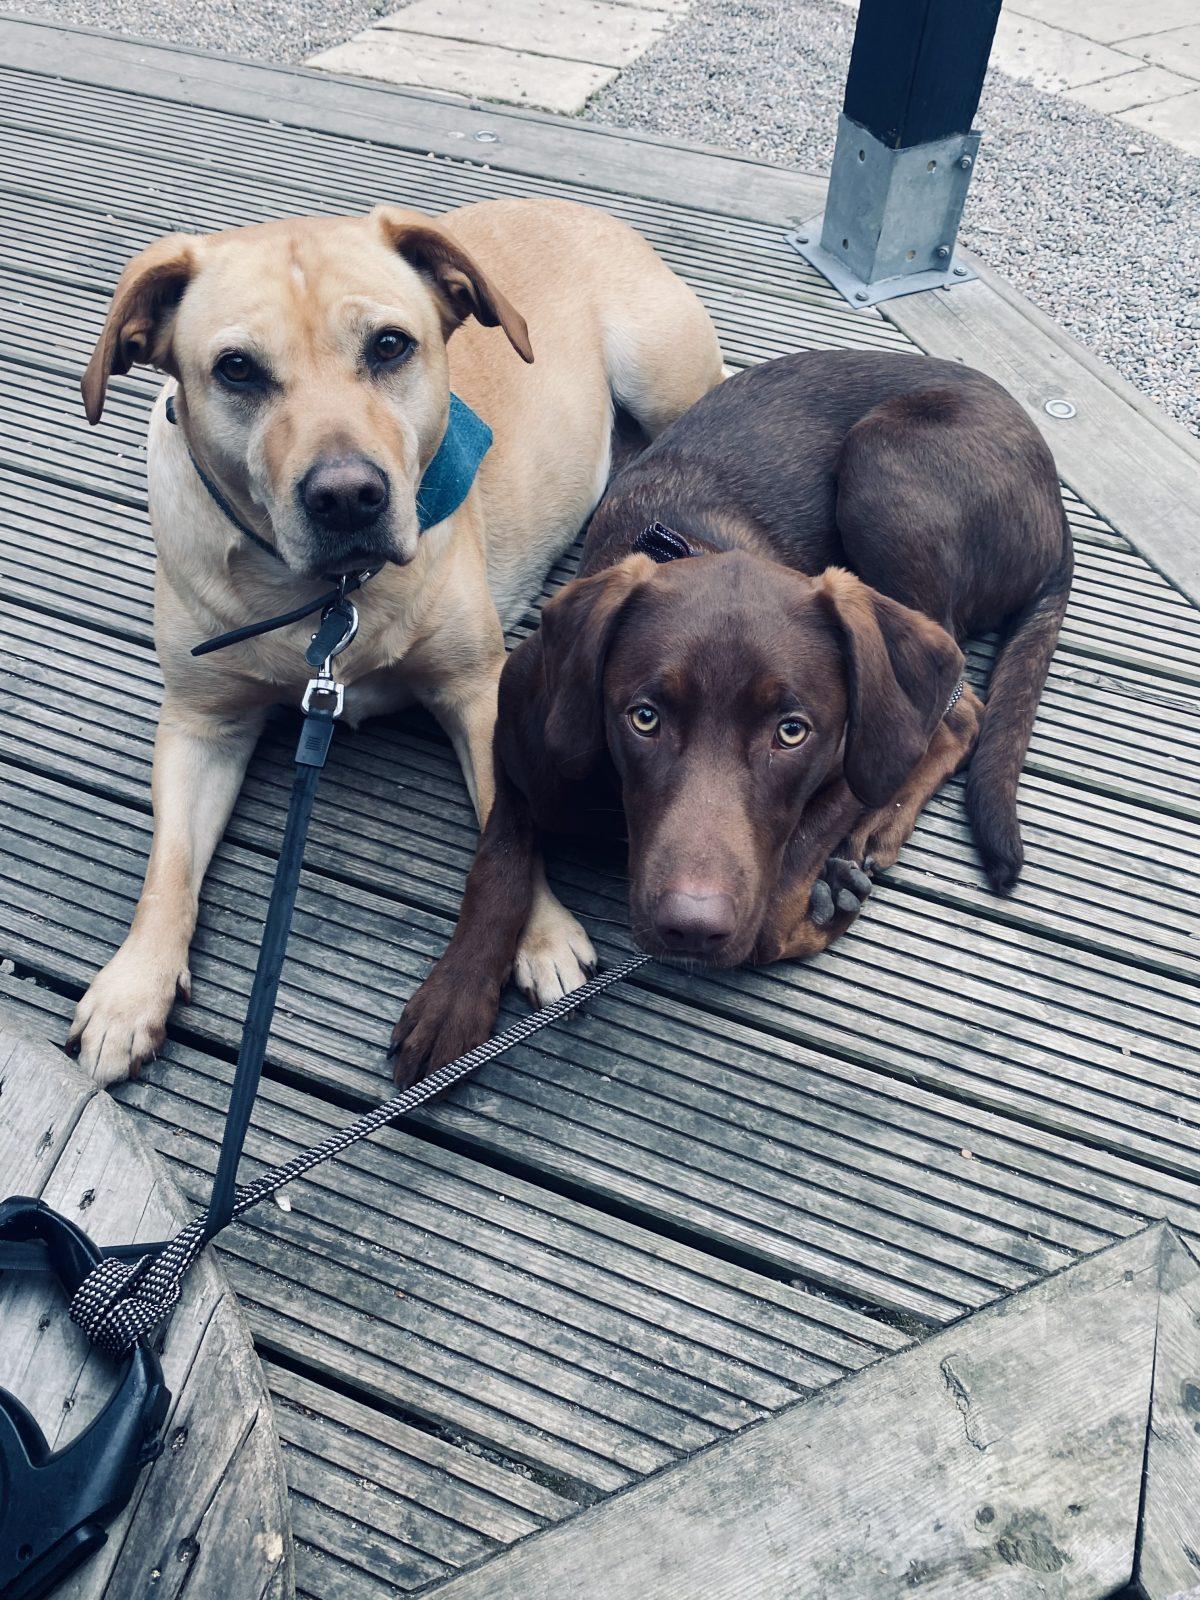 dog friendly restaurant with beer garden in Inverness